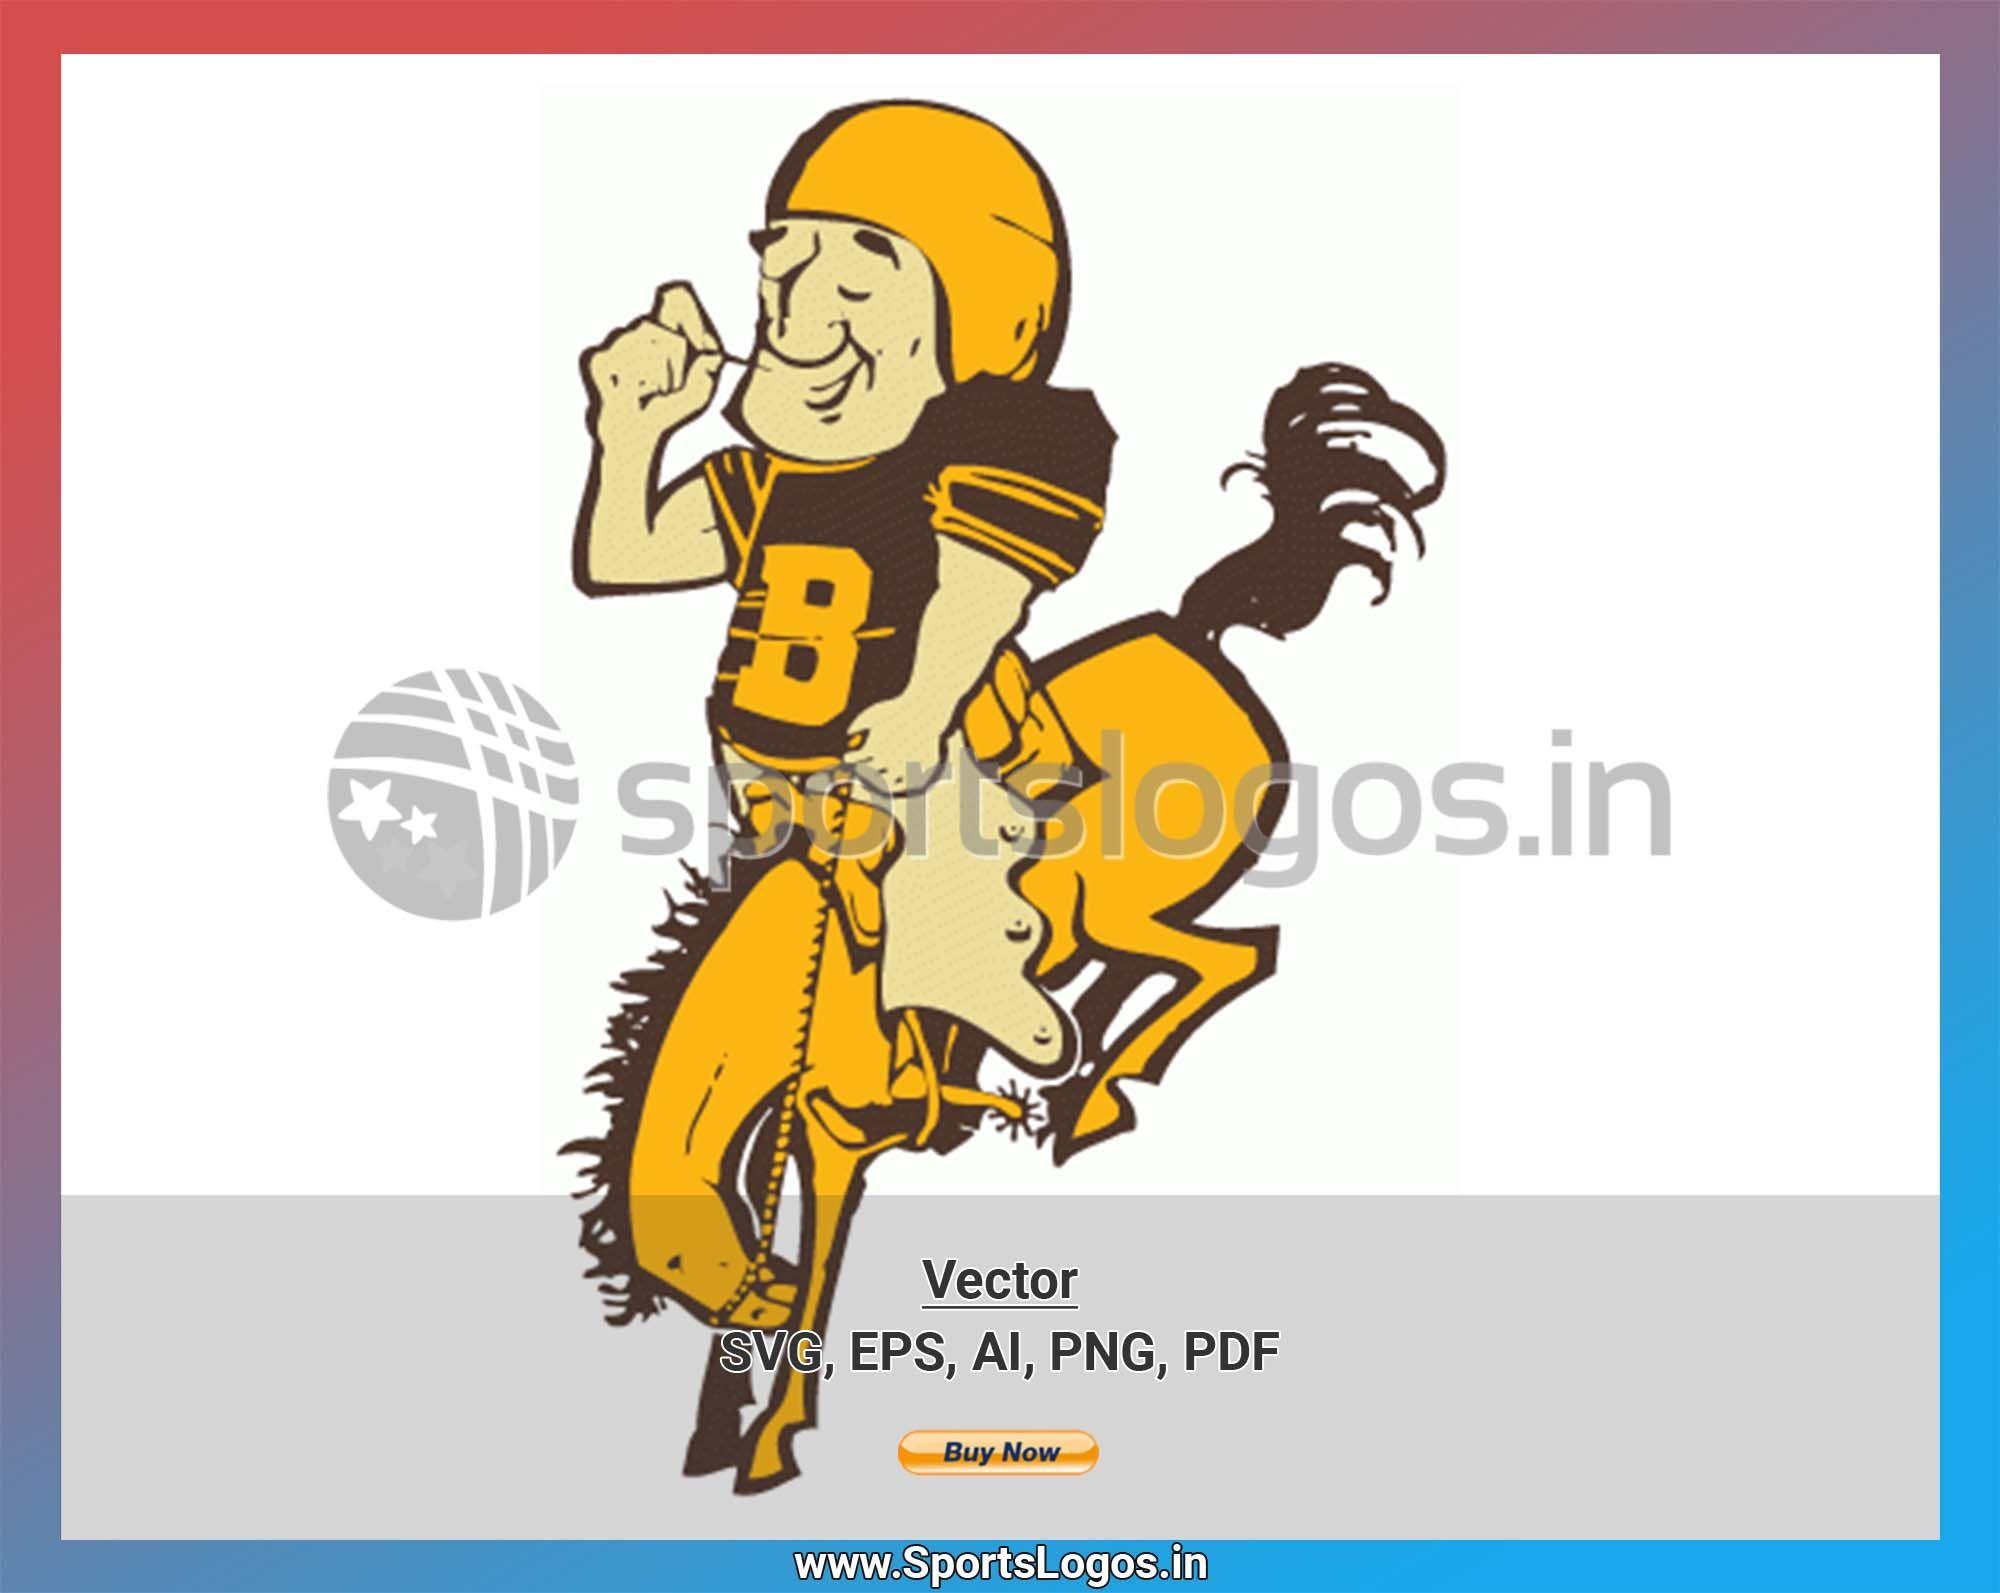 Denver Broncos 19601961, American Football League